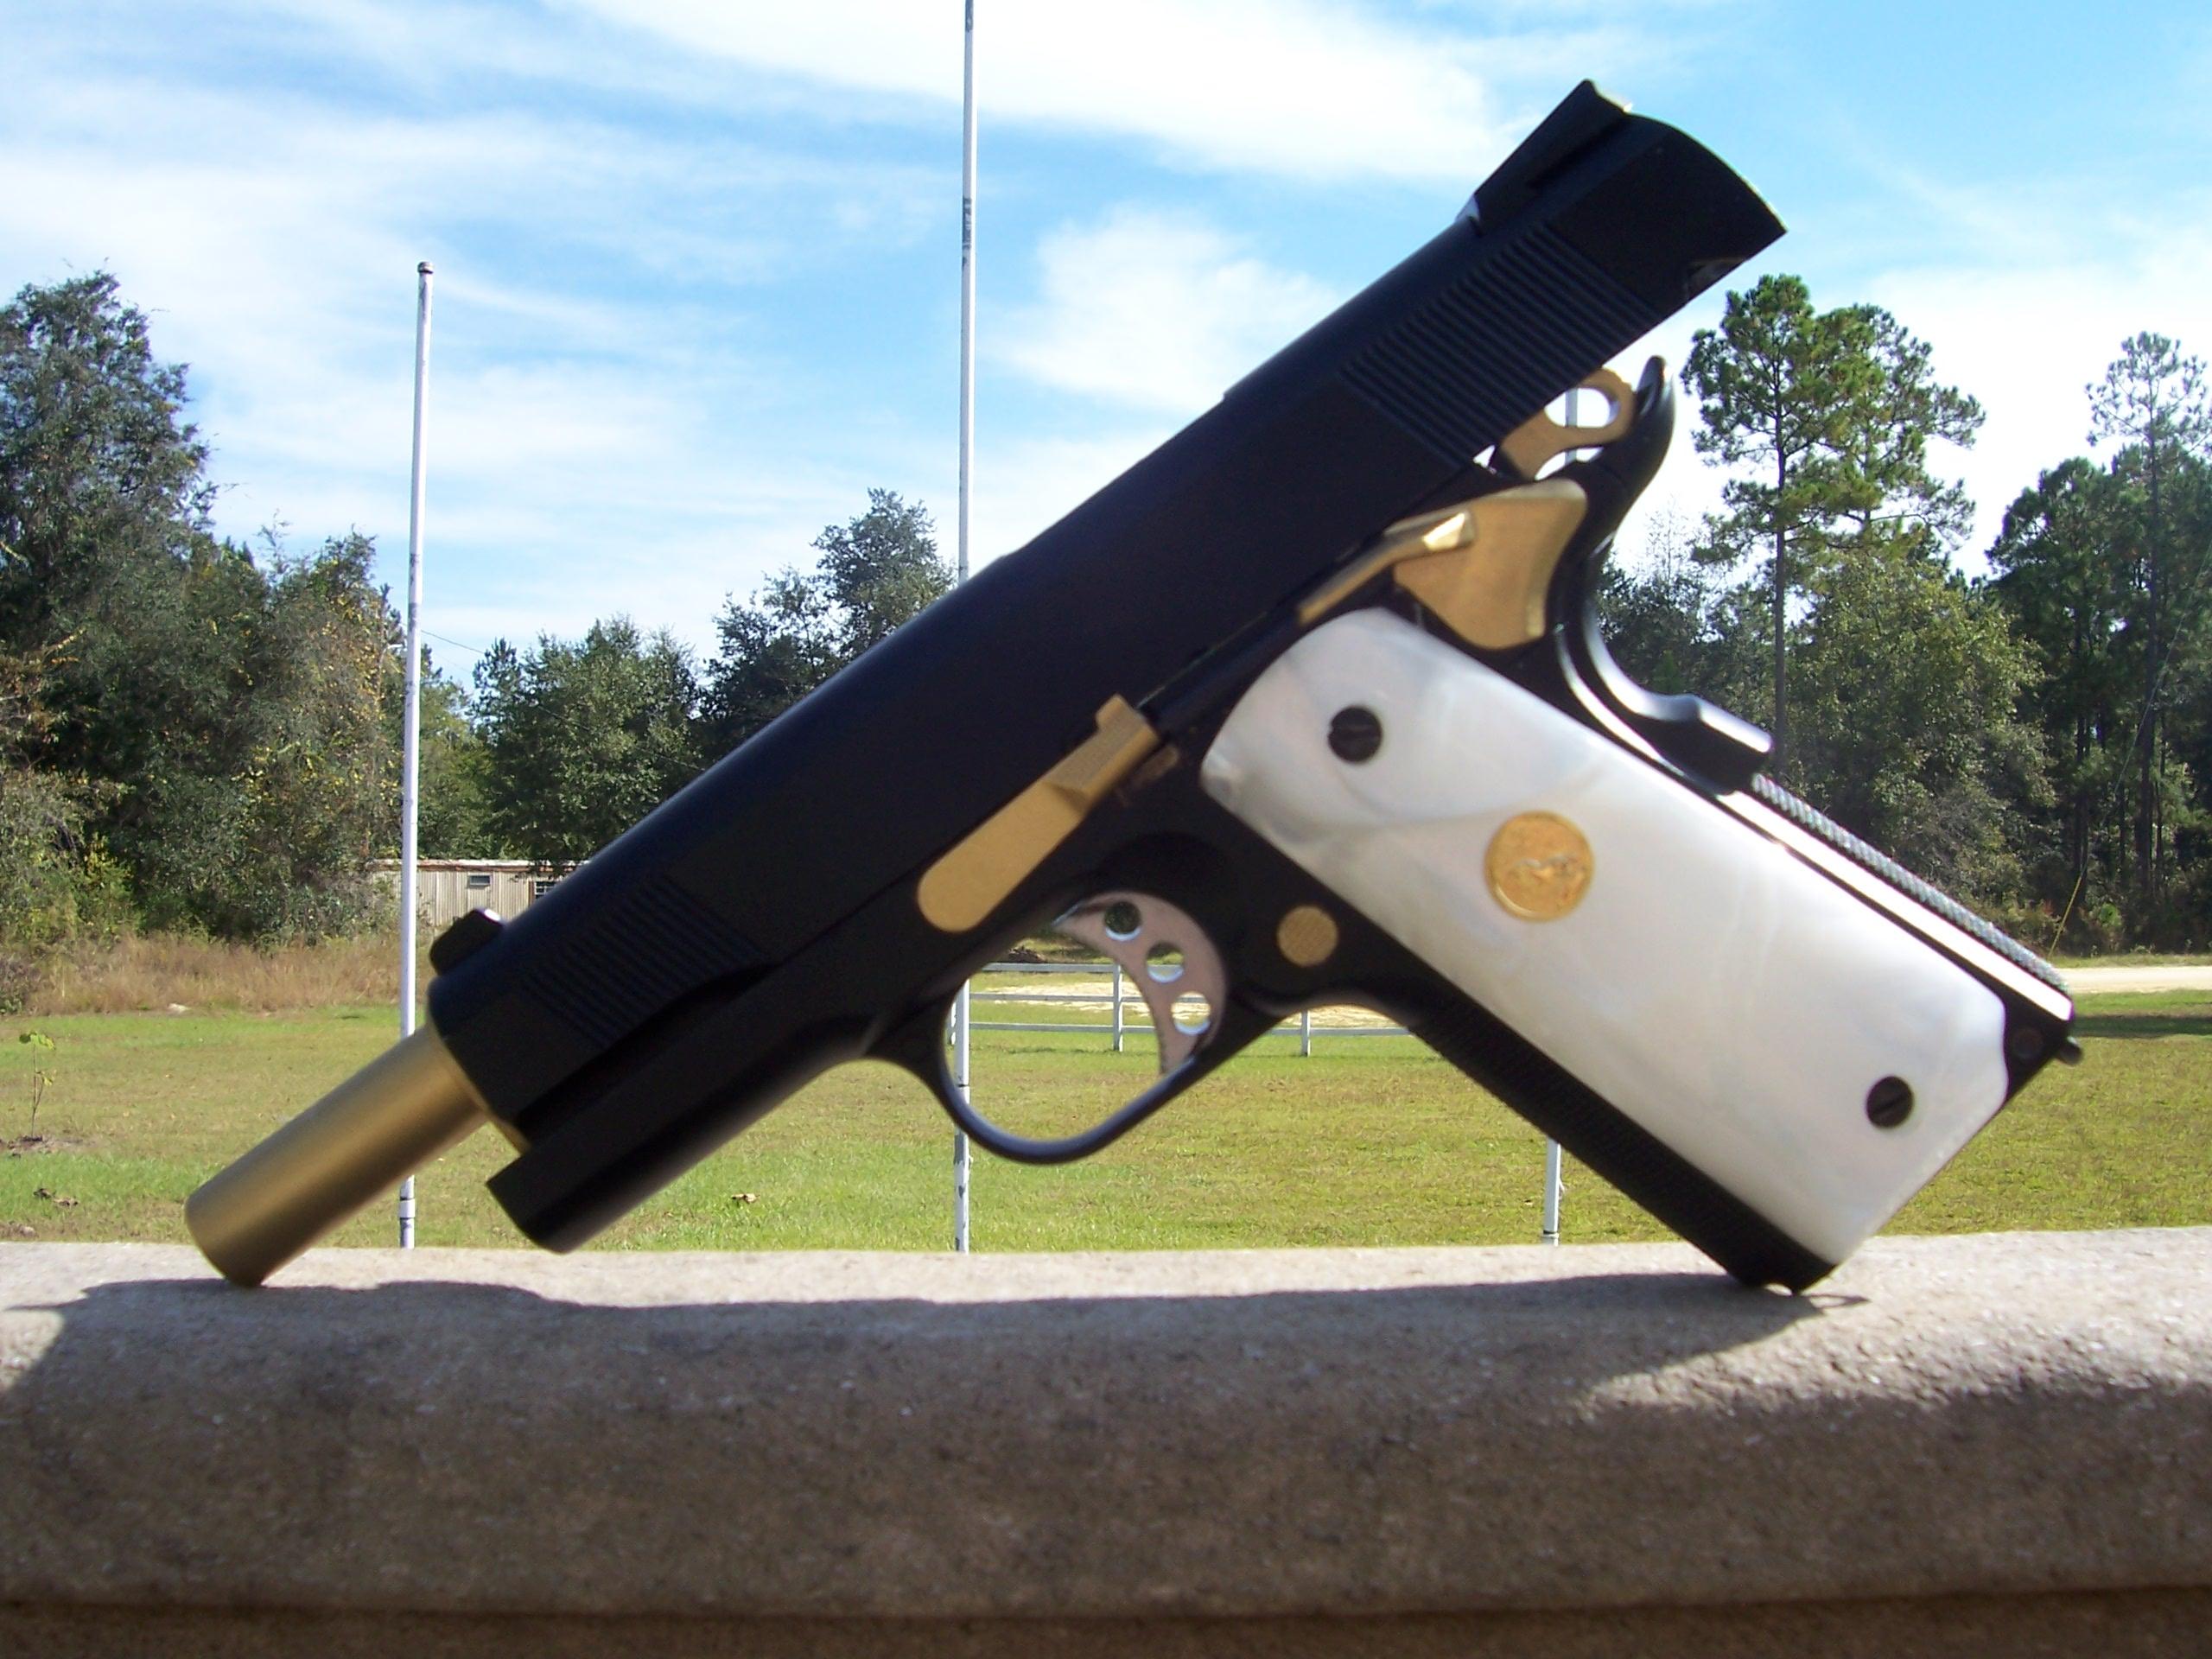 Waffen - Colt Pistol  - Colt 1911 Hintergrundbild